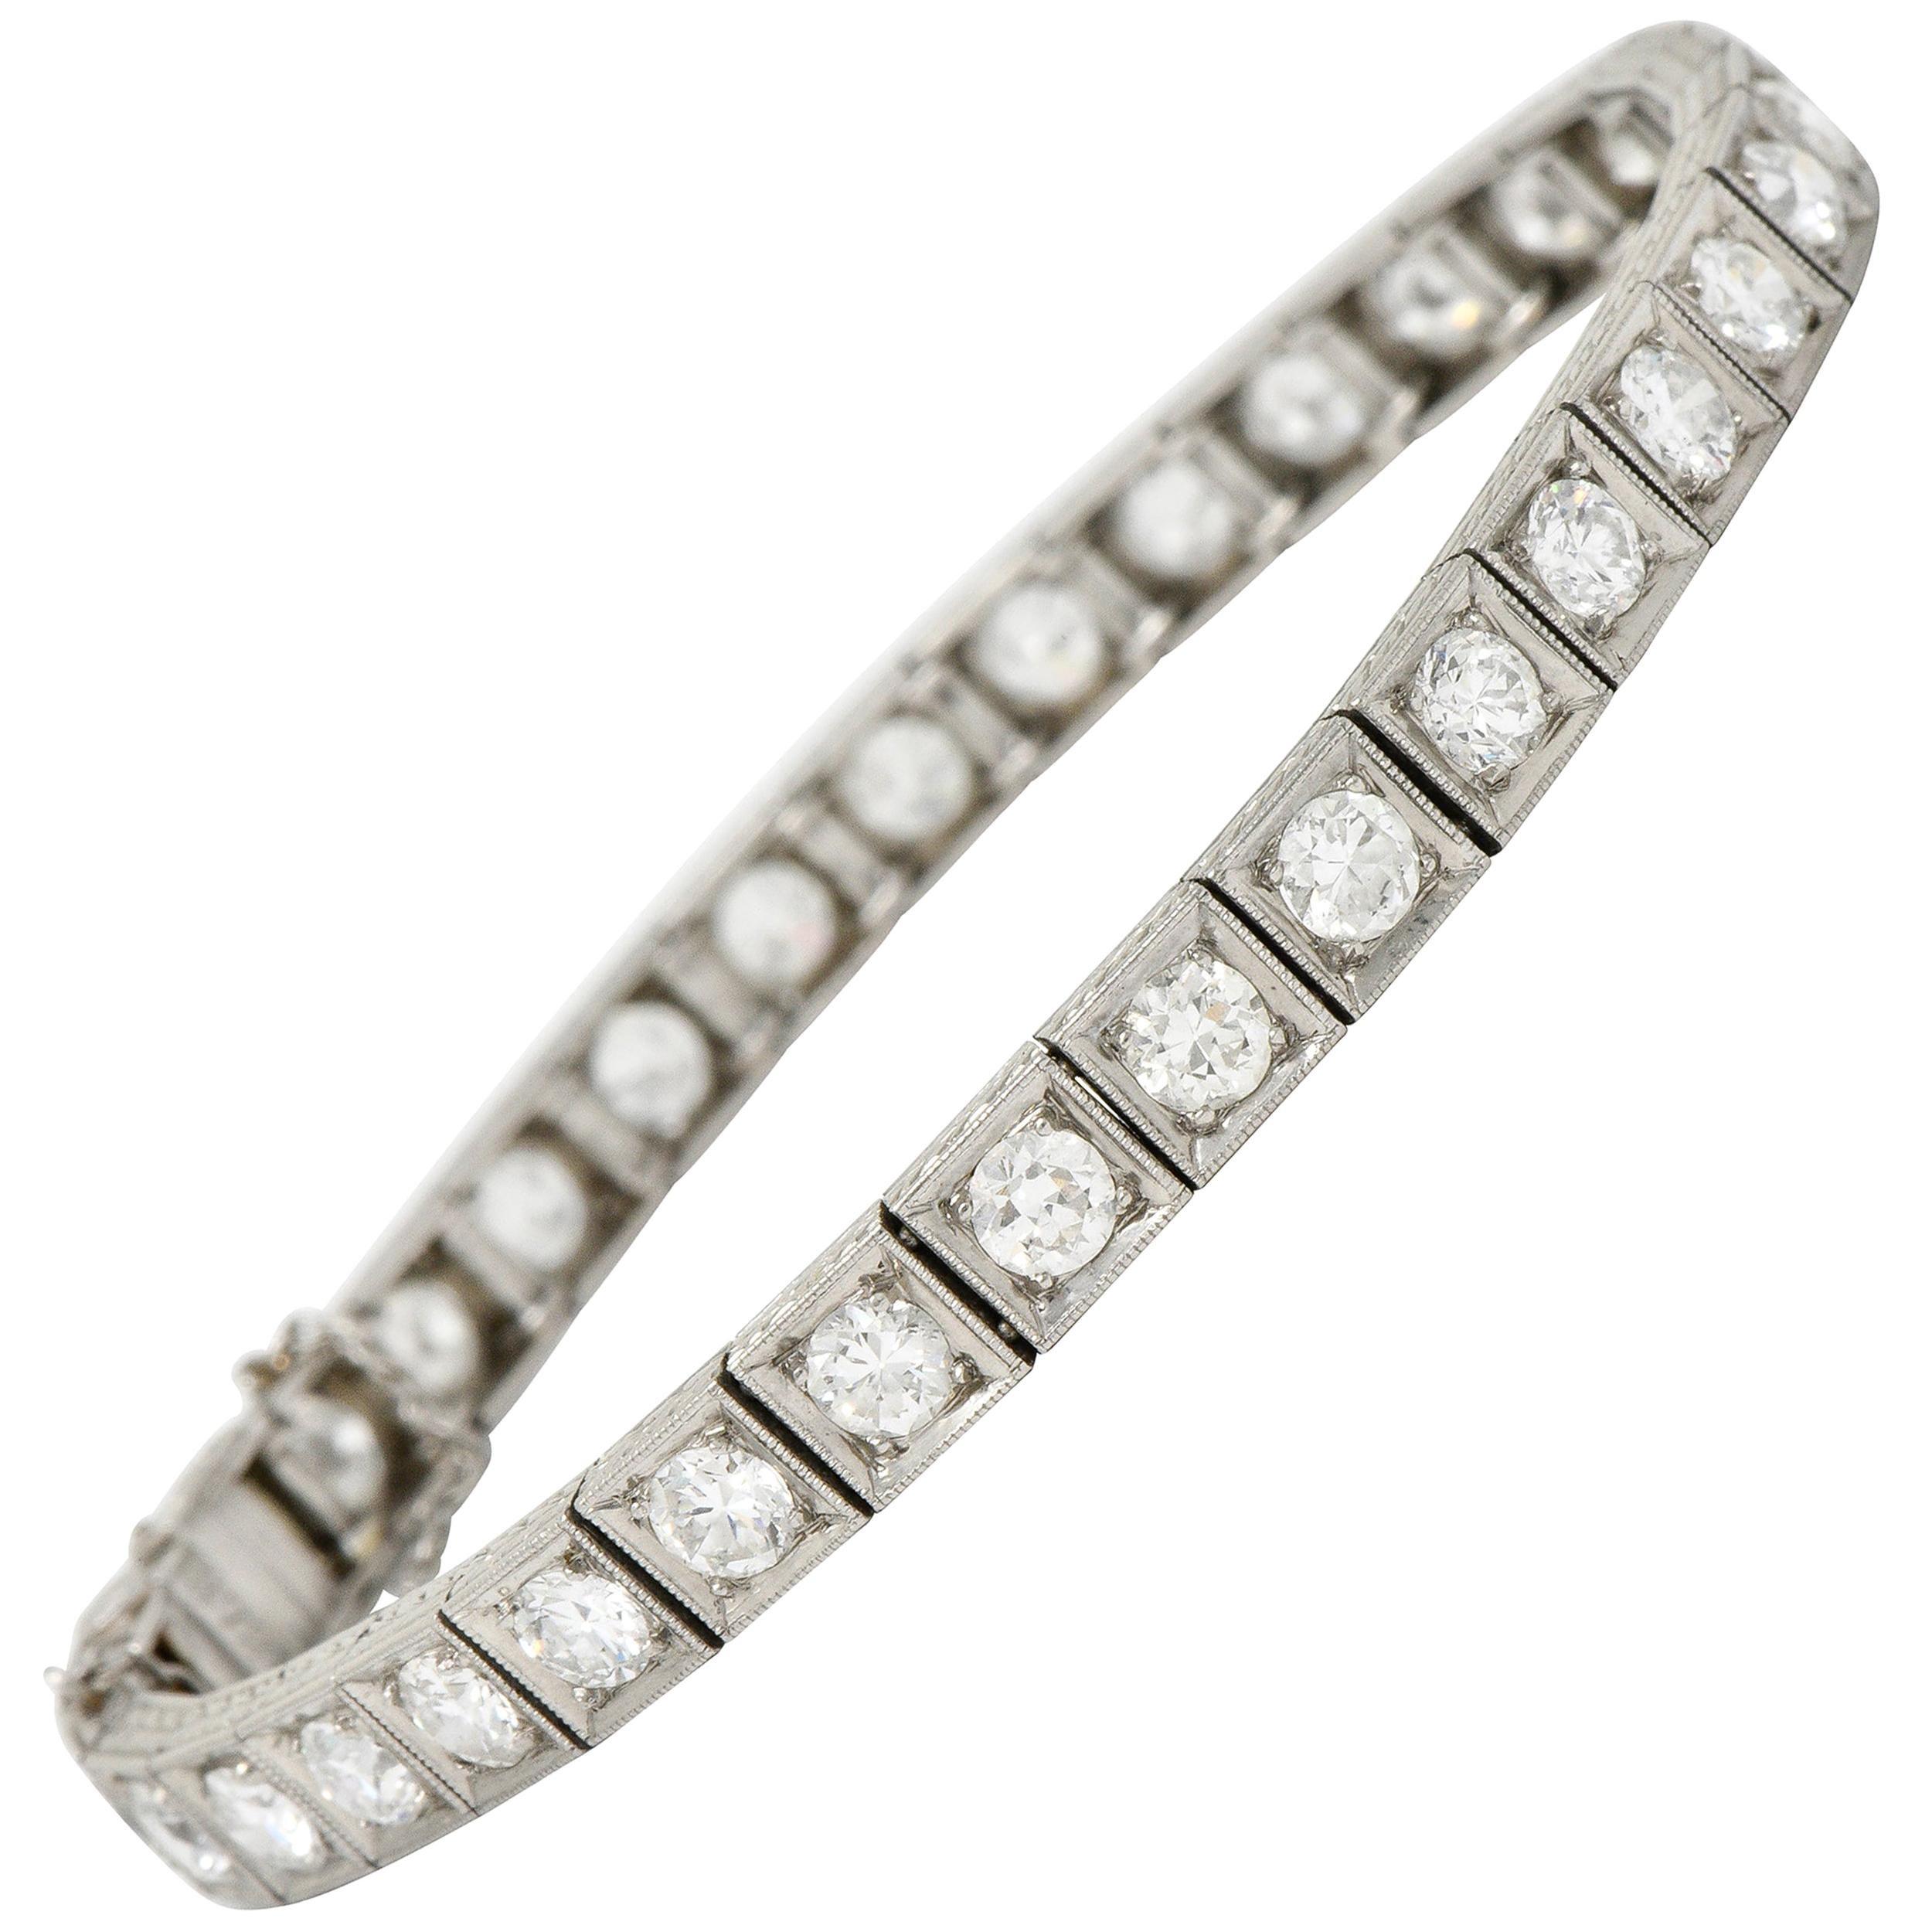 1930s Art Deco 5.90 Carat Diamond Platinum Line Bracelet